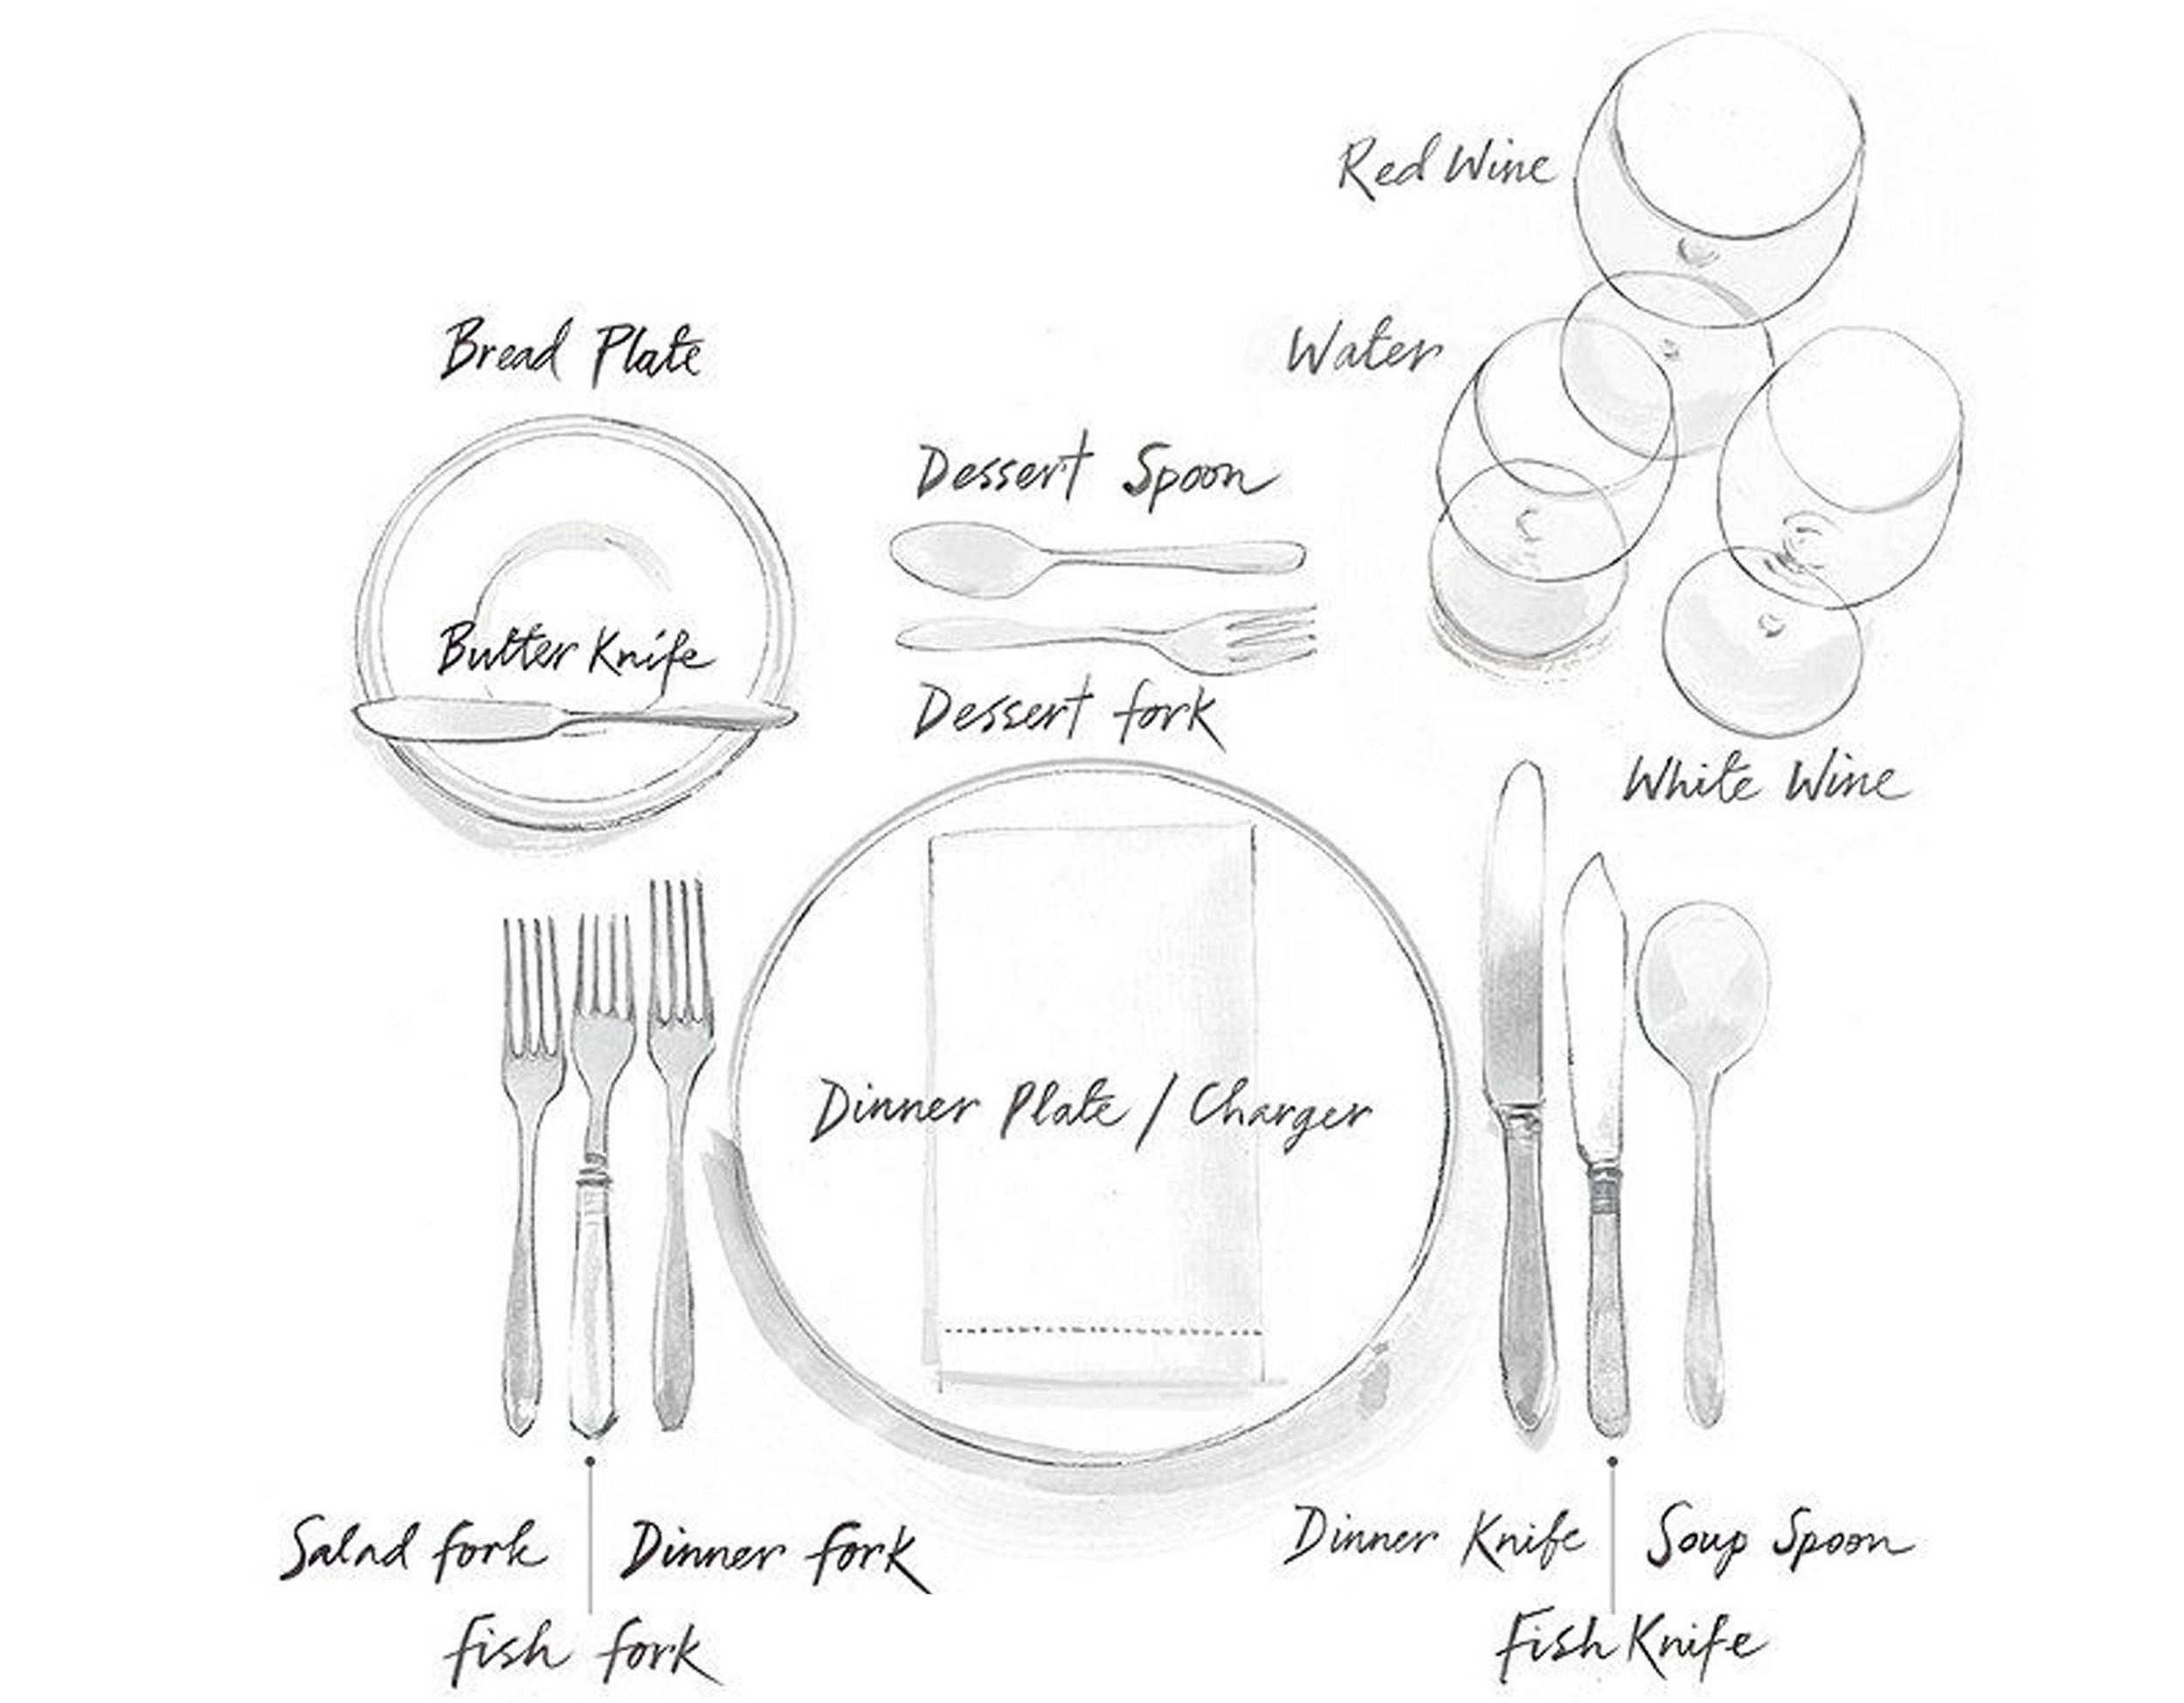 formal table setting via  One Kings Lane